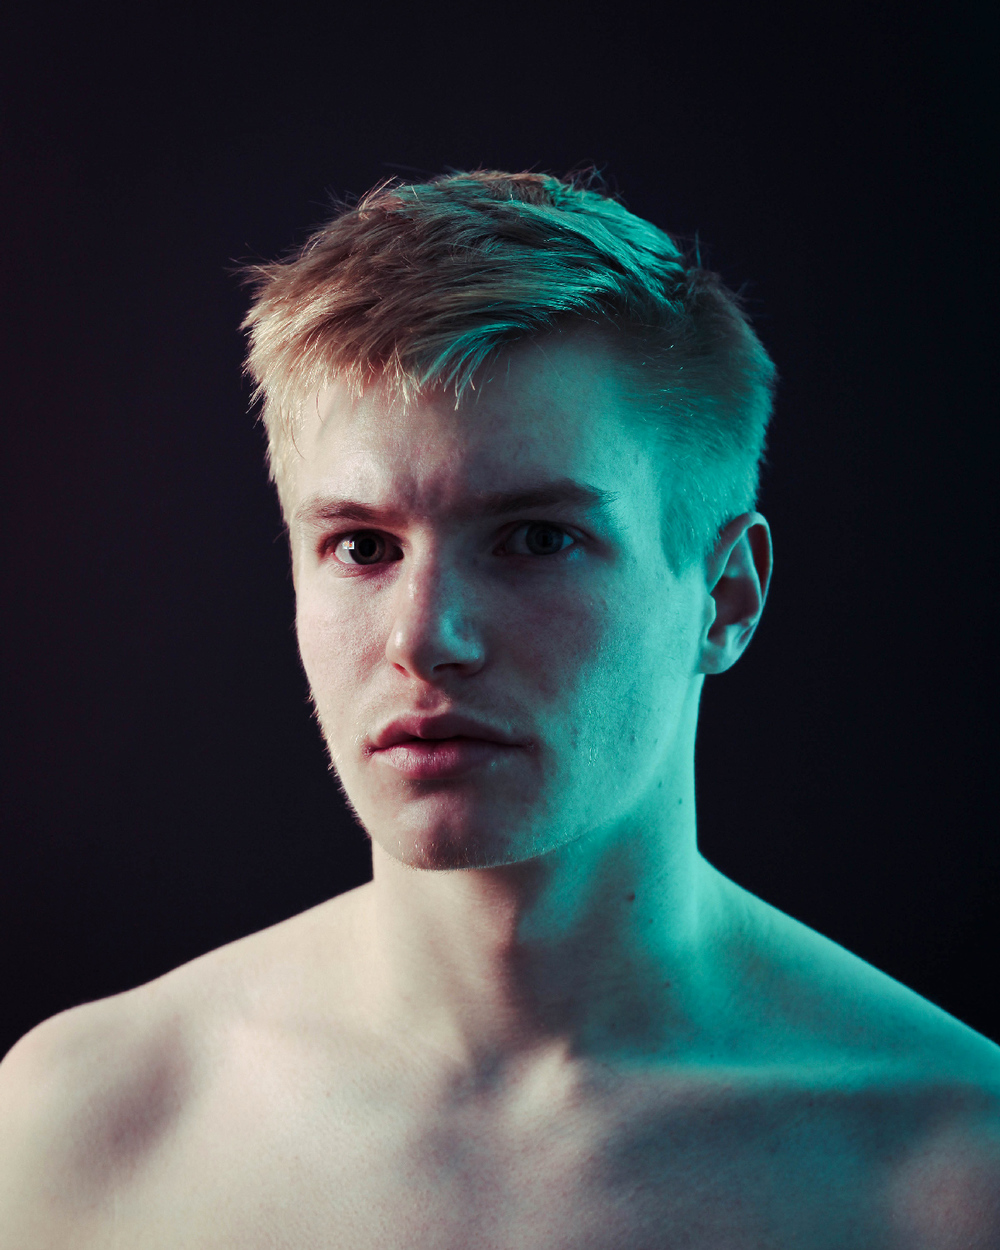 Max Hartmann photo - about